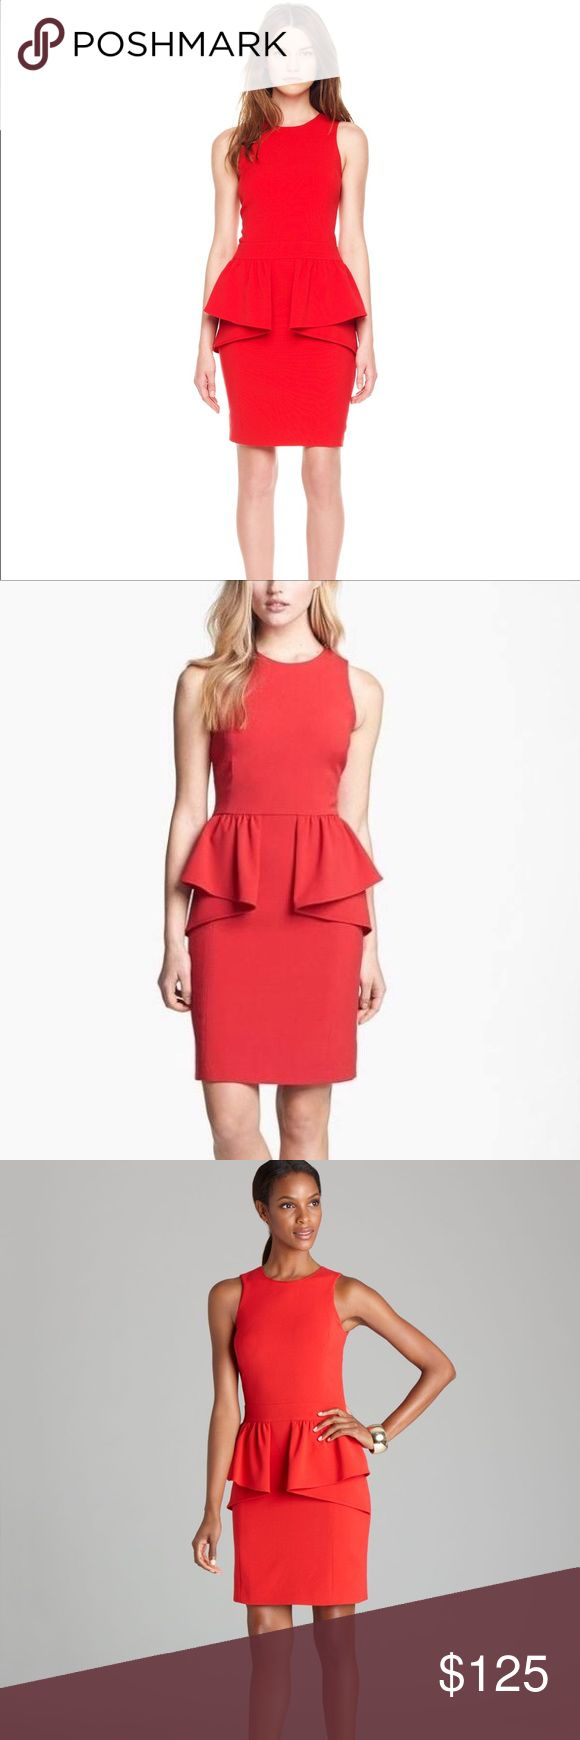 MICHAEL Michael Kors Red Jersey Peplum Dress Perfect condition, only worn a few times! MICHAEL Michael Kors Dresses Midi